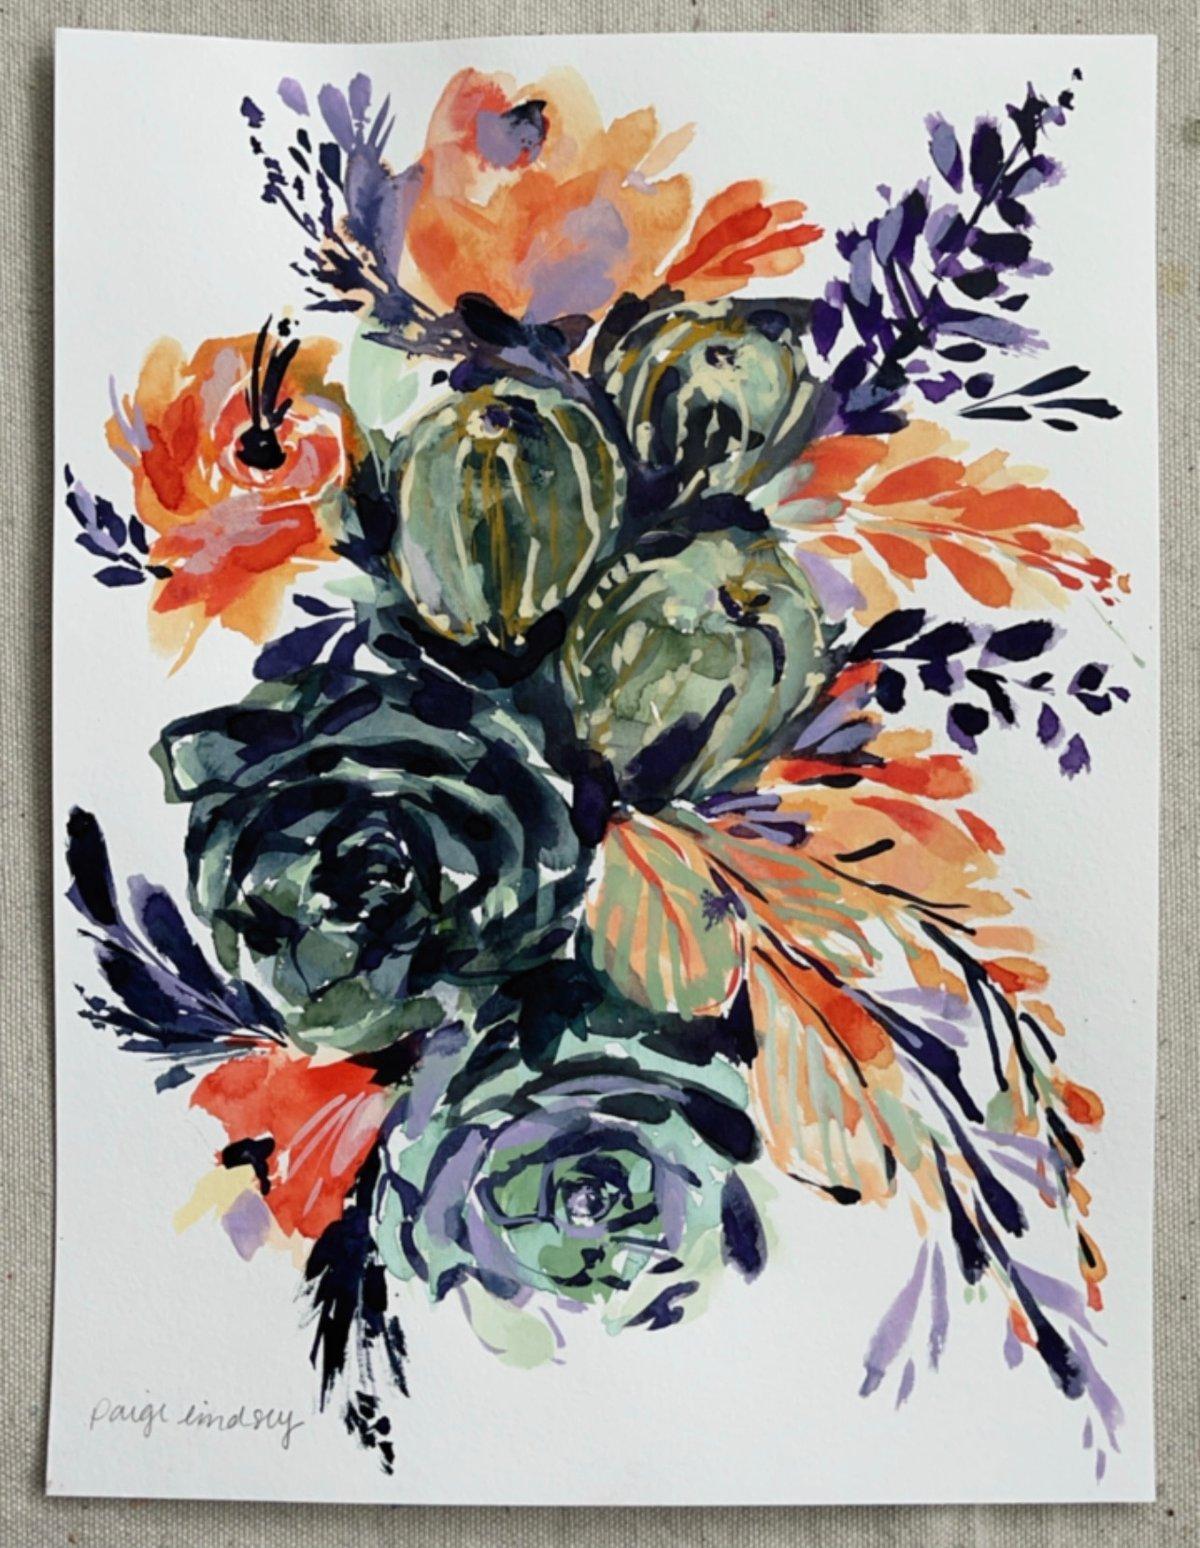 Image of Bright Cactus Bouquet - Original Watercolor Painting